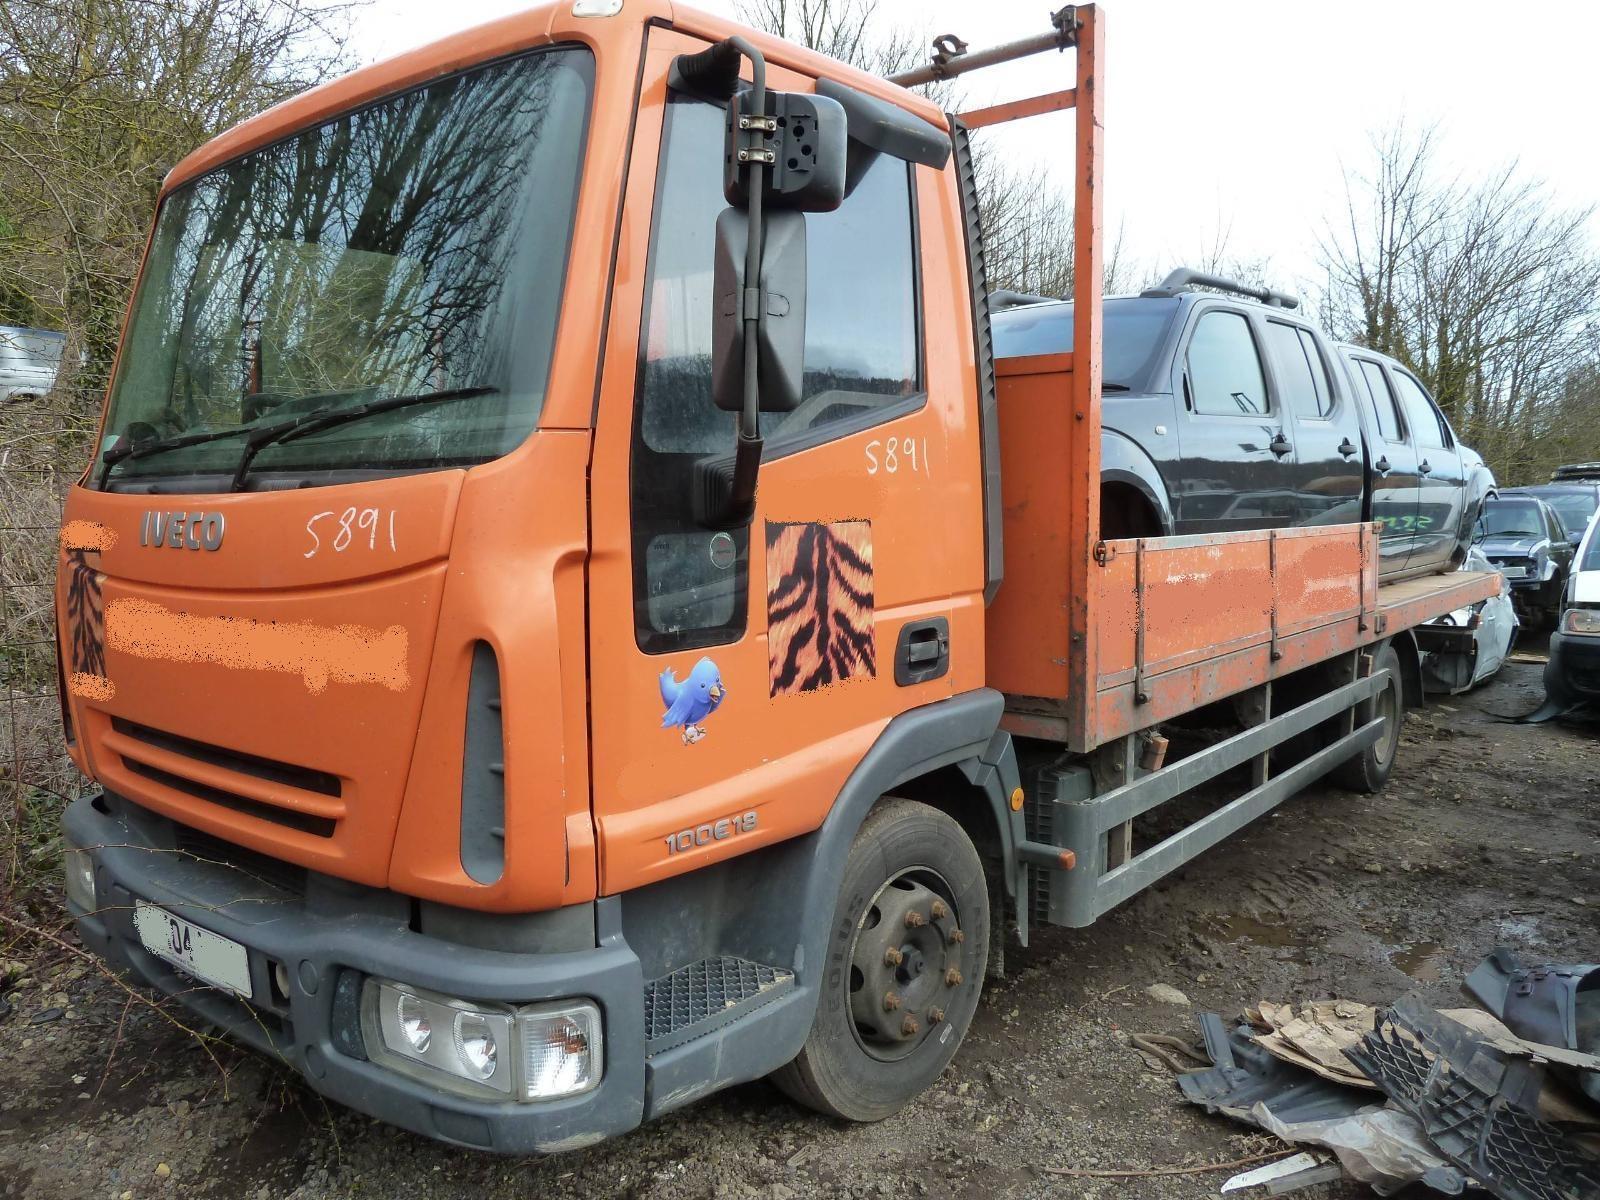 Image for a IVECO EURO CARGO 2004 2 Door Truck